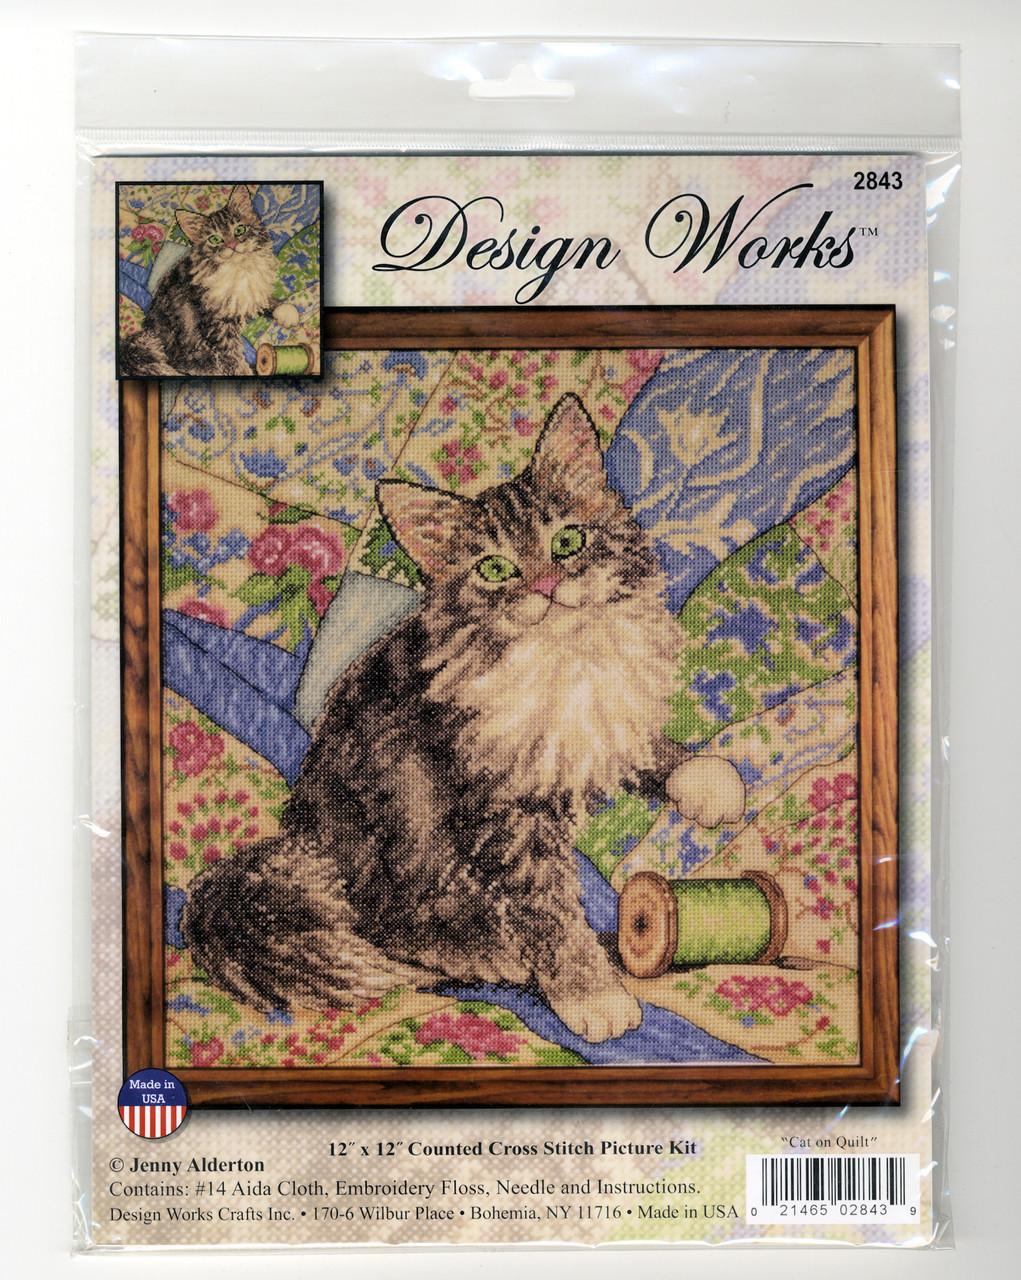 Design Works - Cat on Quilt